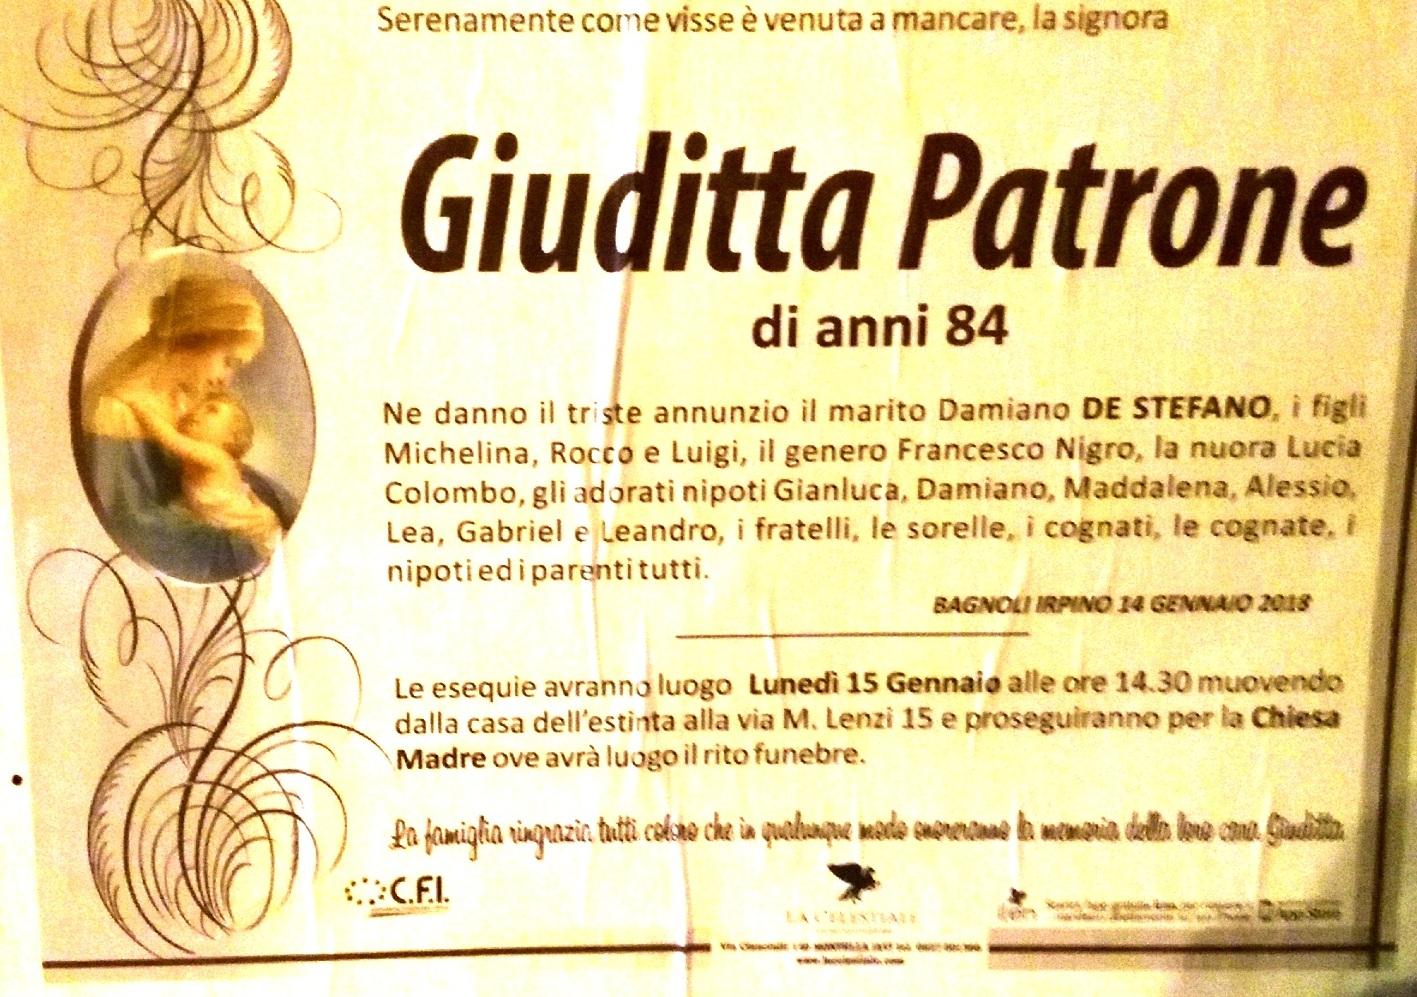 Giudittta-Patrone